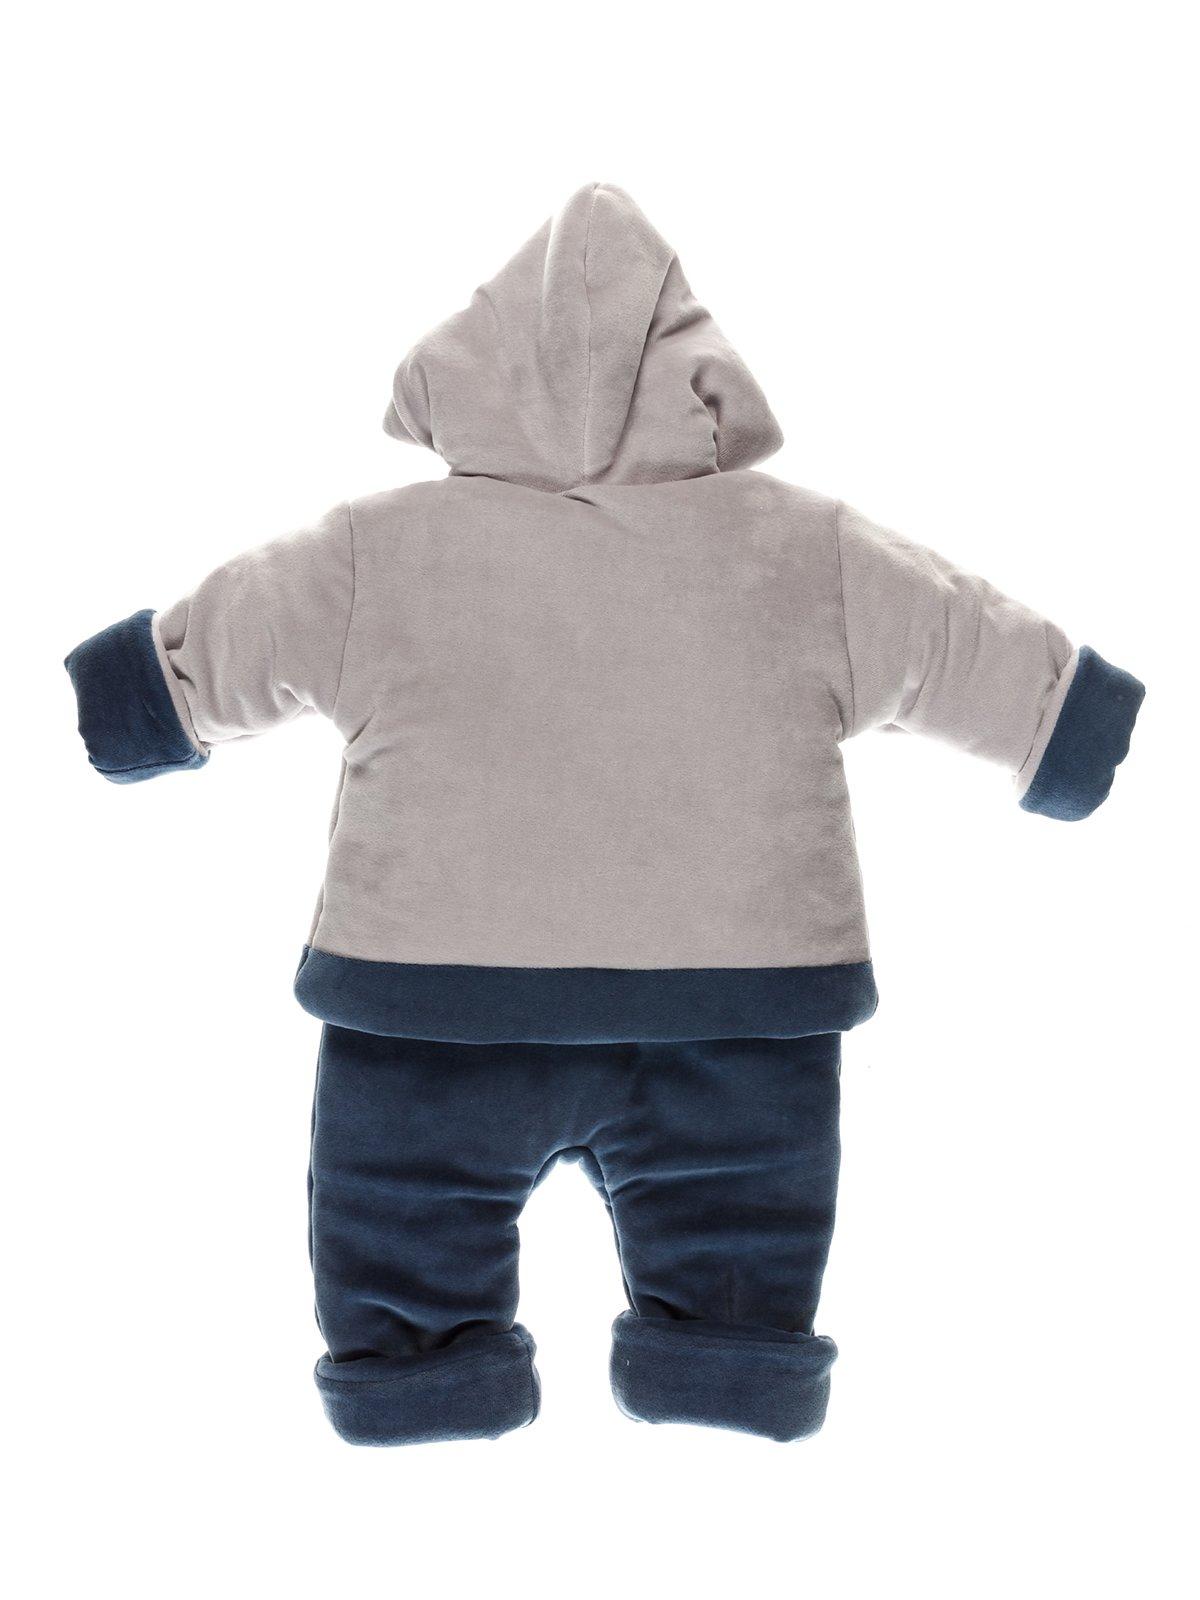 Комплект: куртка и комбинезон | 3742099 | фото 3